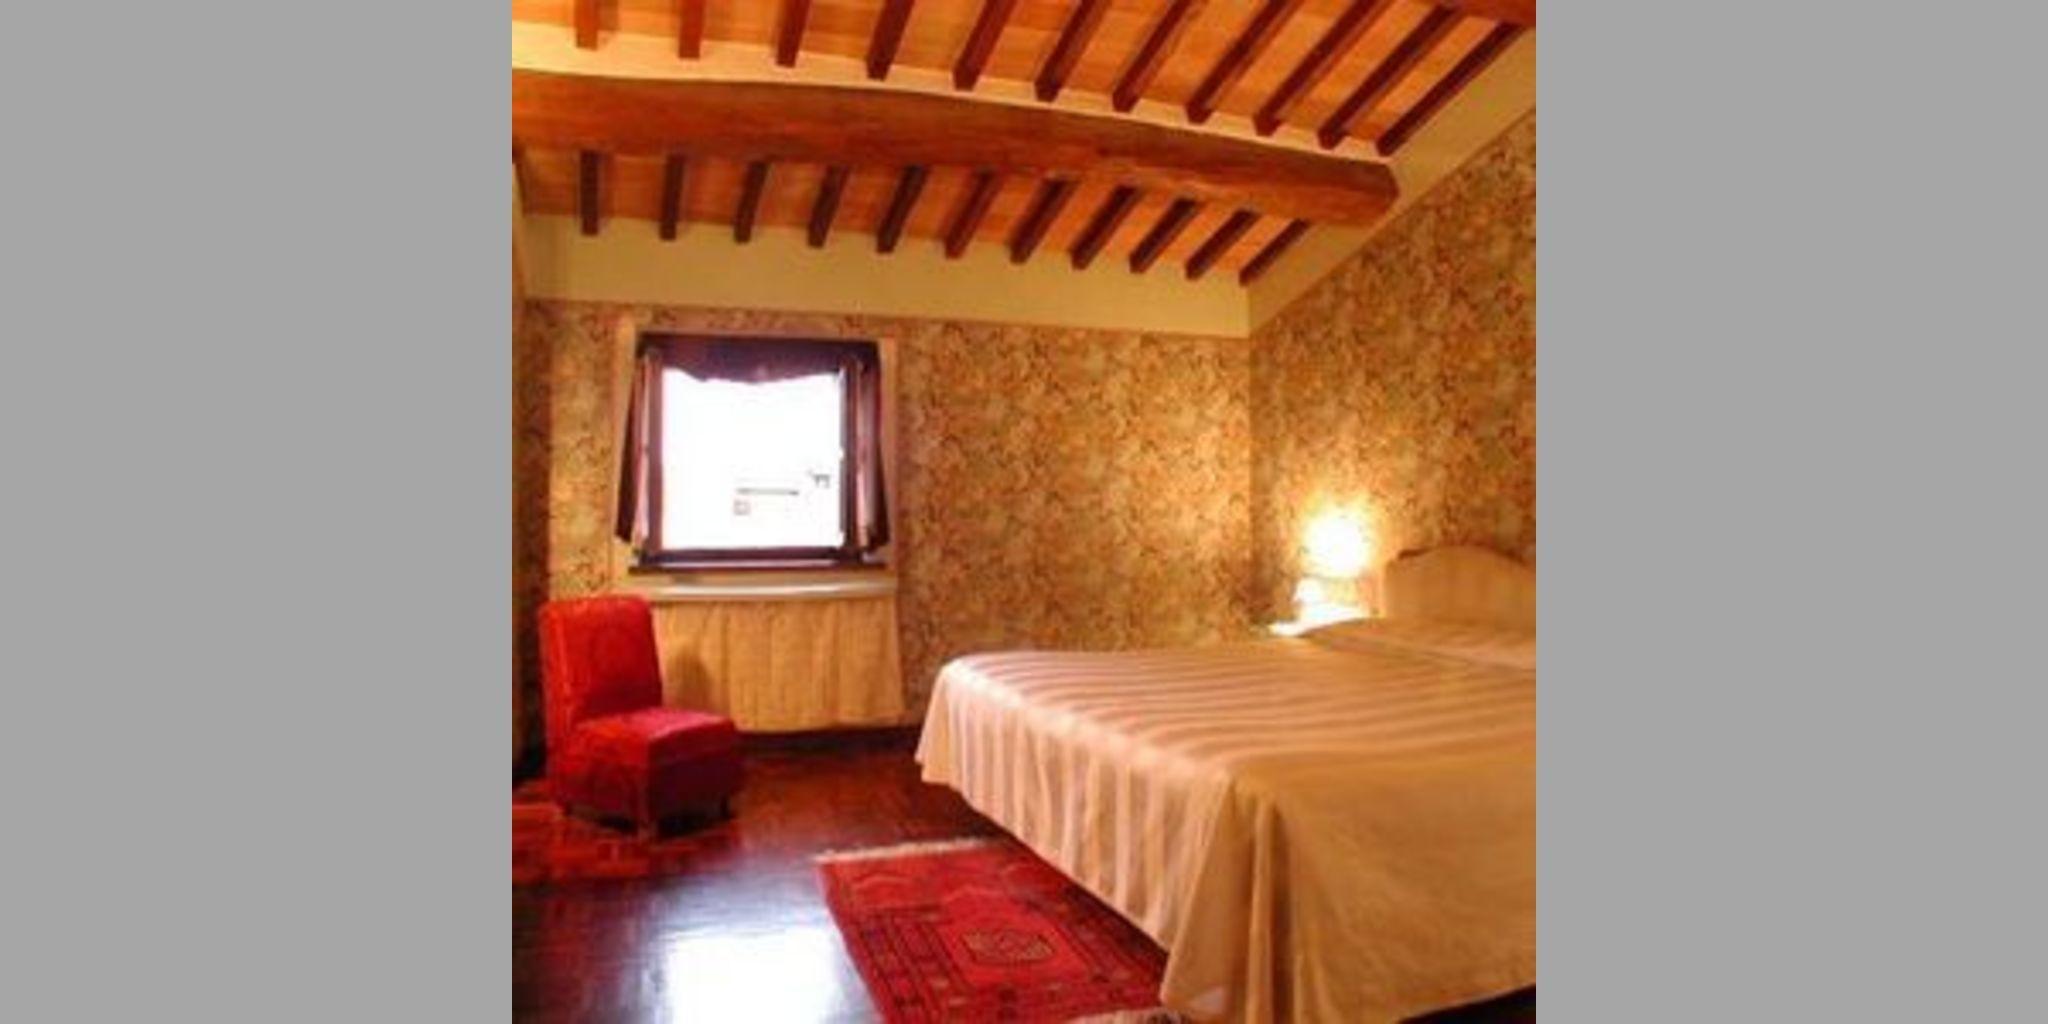 Bed & Breakfast Sansepolcro - Palmiro Togliatti2